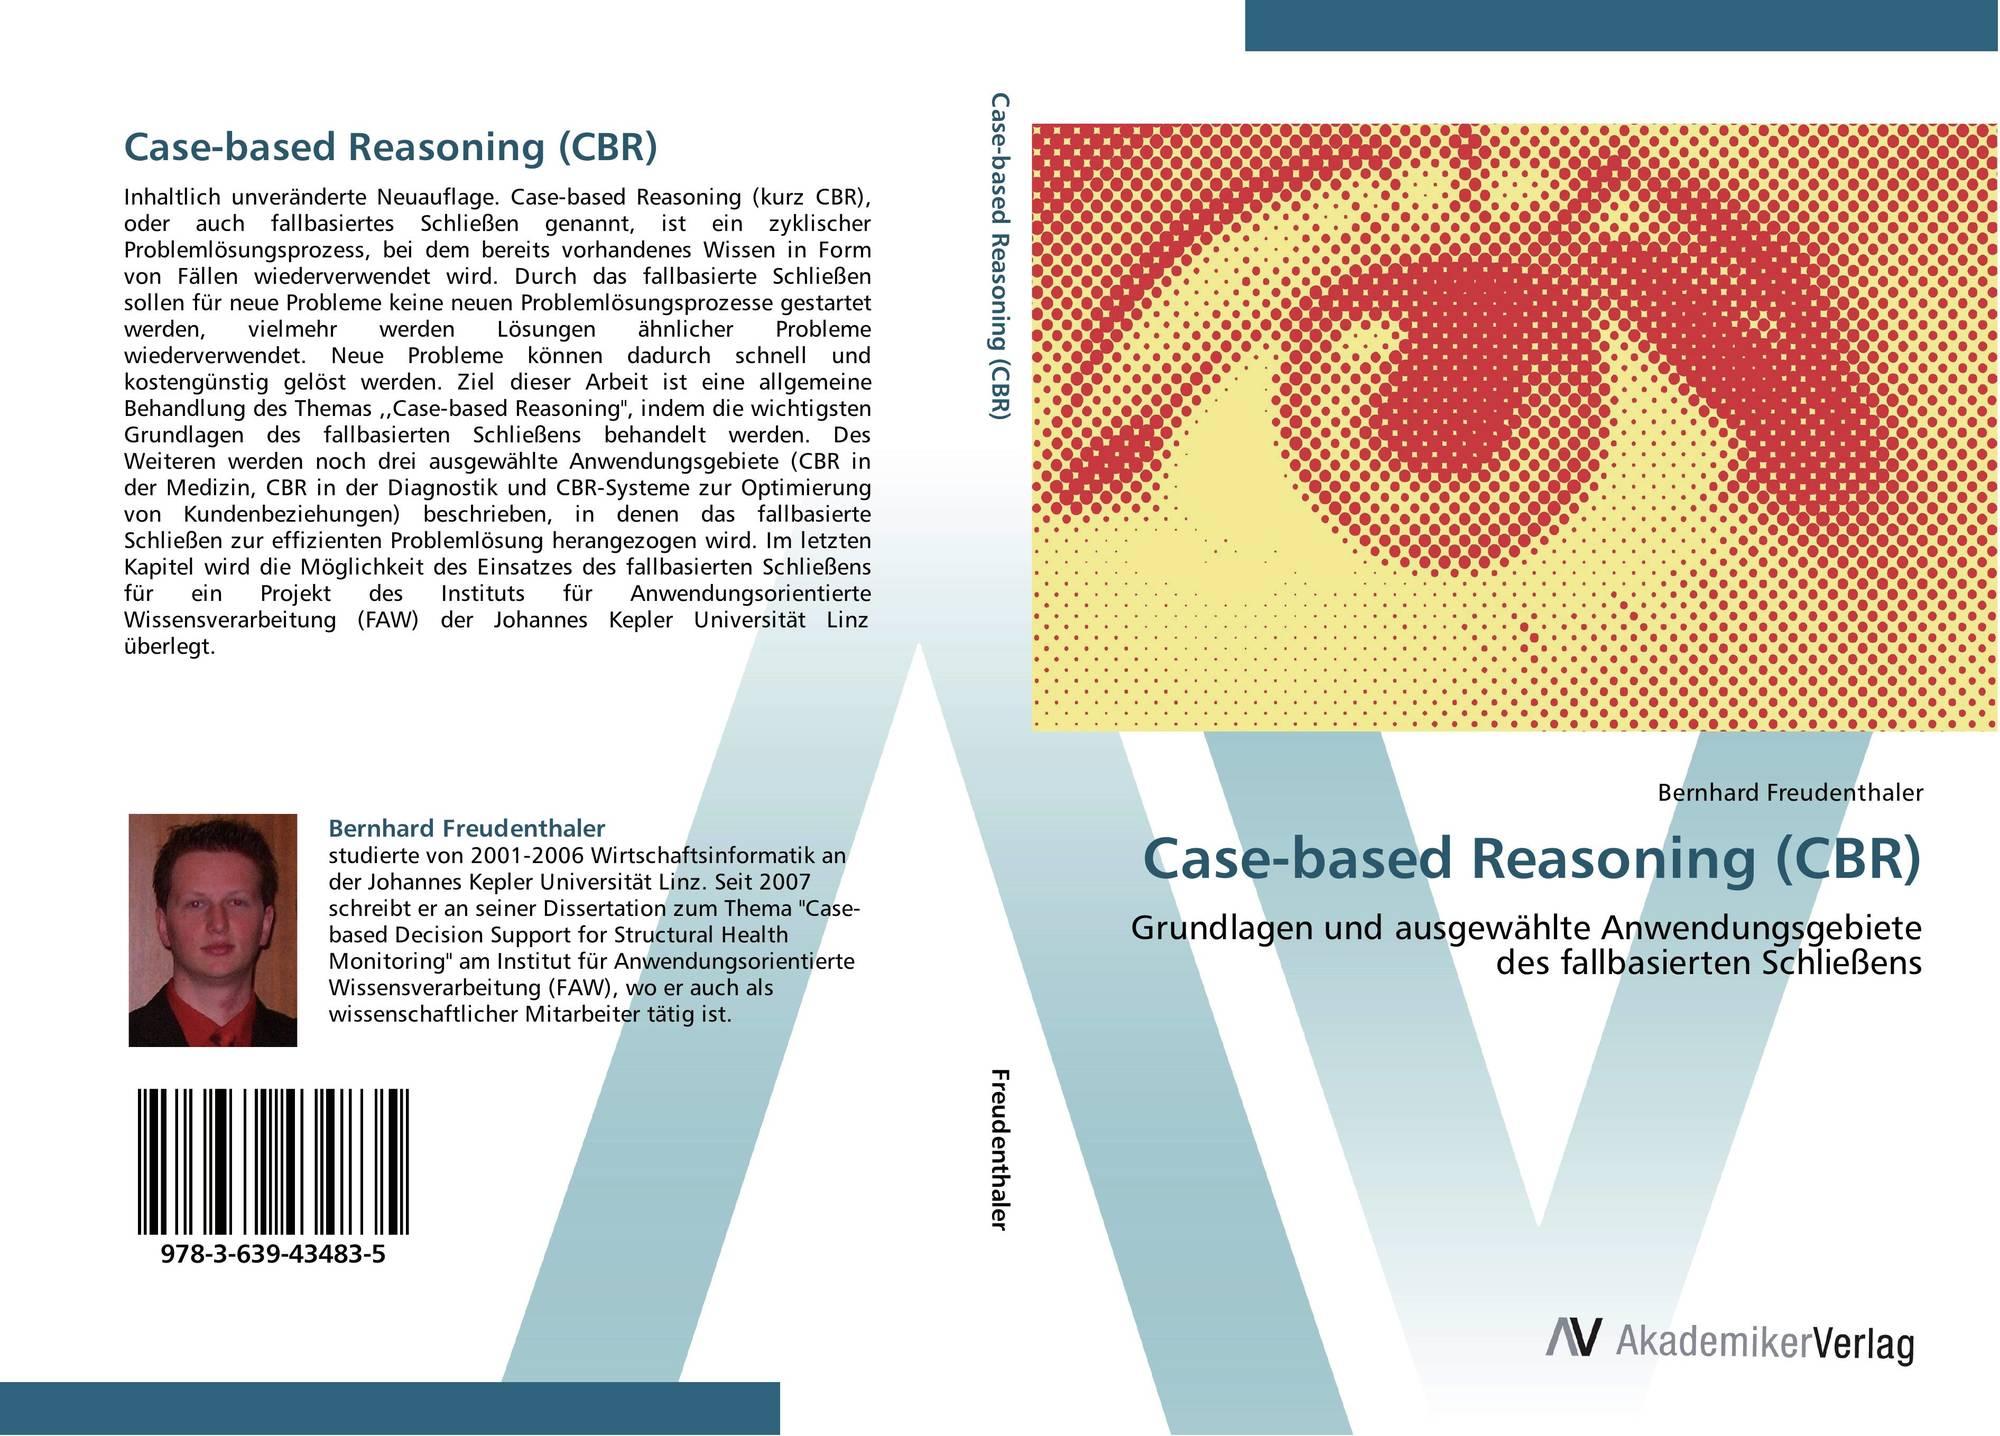 cbr case based reasoning